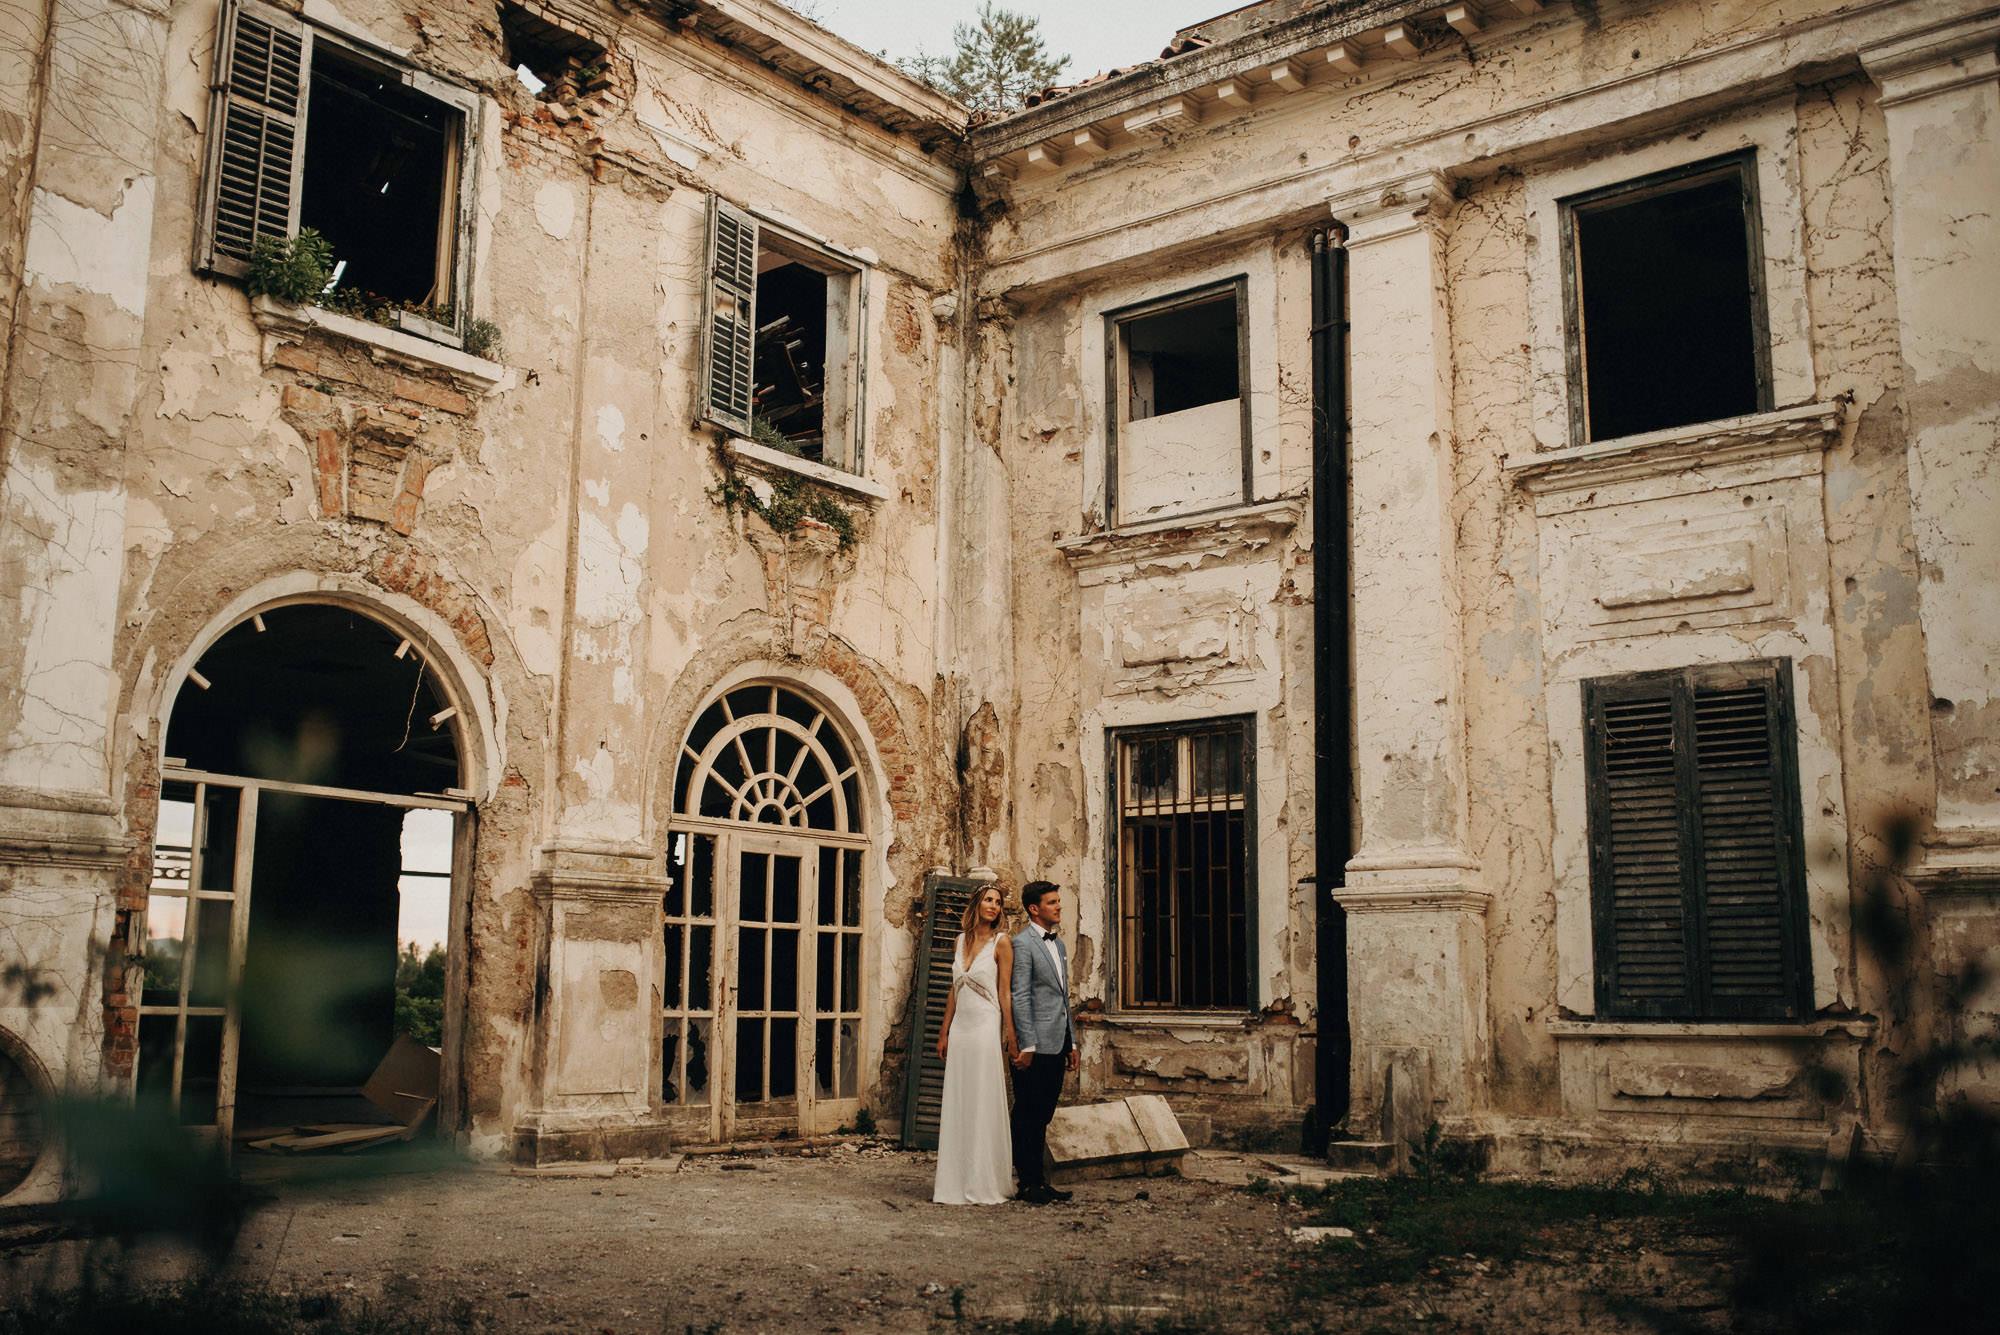 dubrovnik_croatia_wedding_photographer-jere_satamo-destination_weddings-115-web.jpg